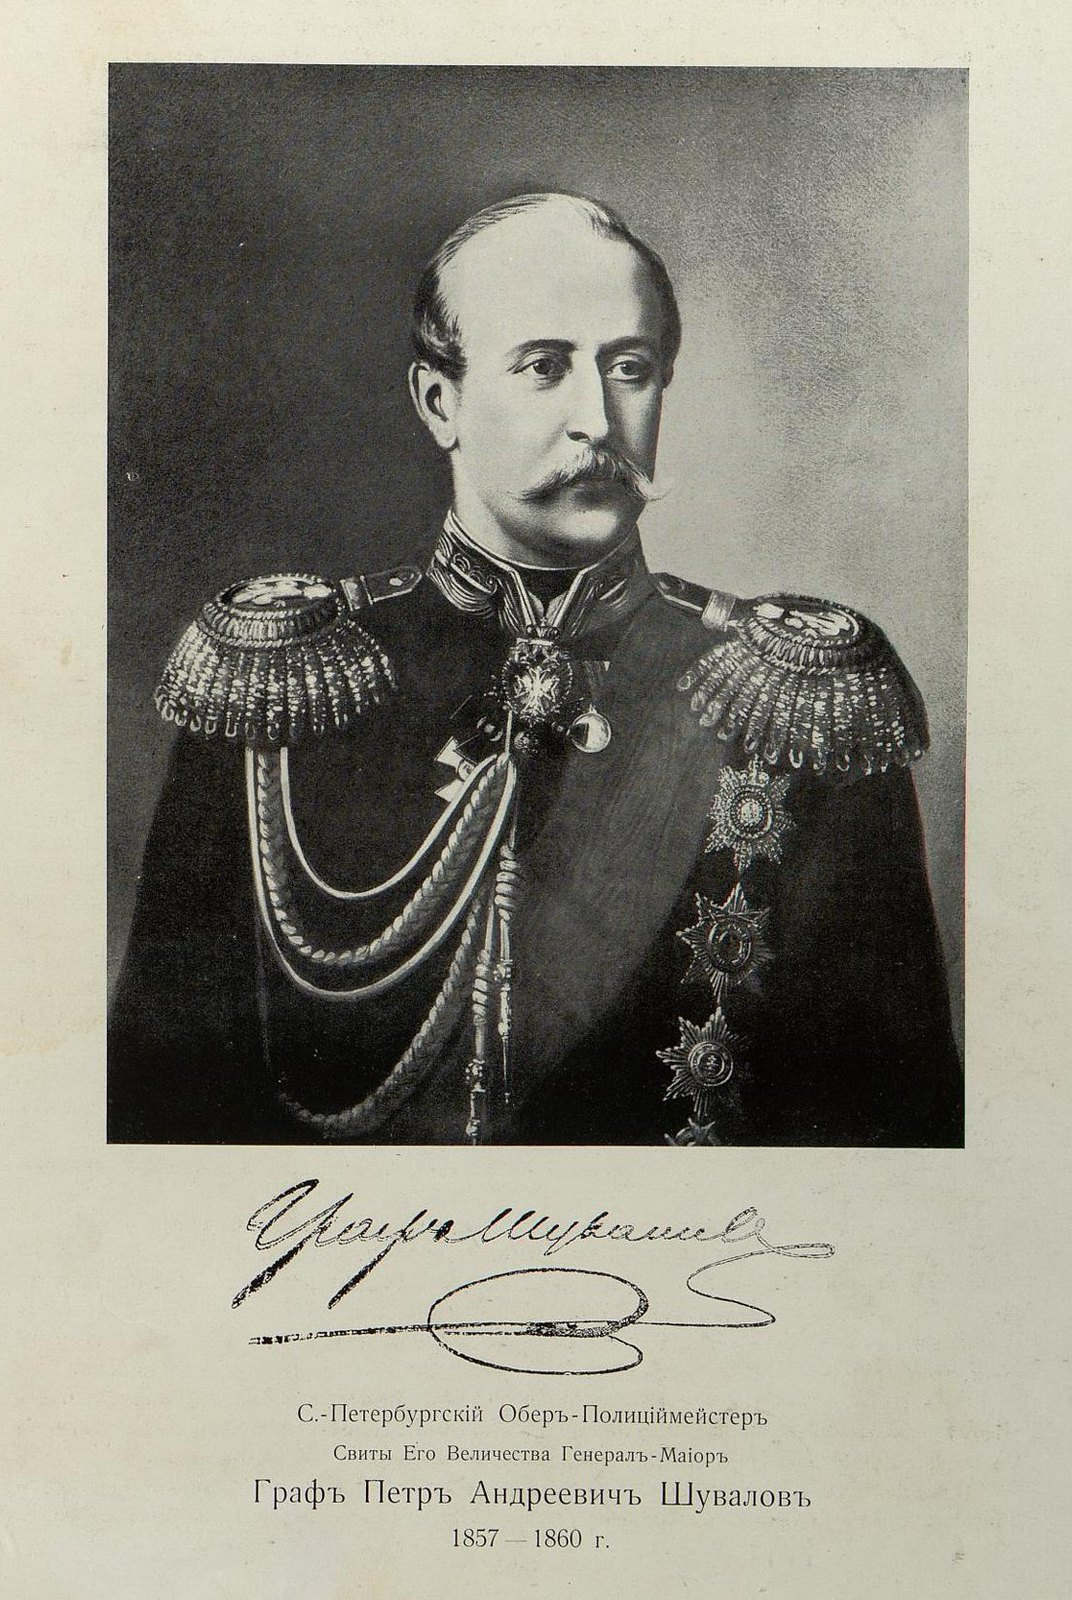 17. Портрет графа Петра Андреевича Шувалова